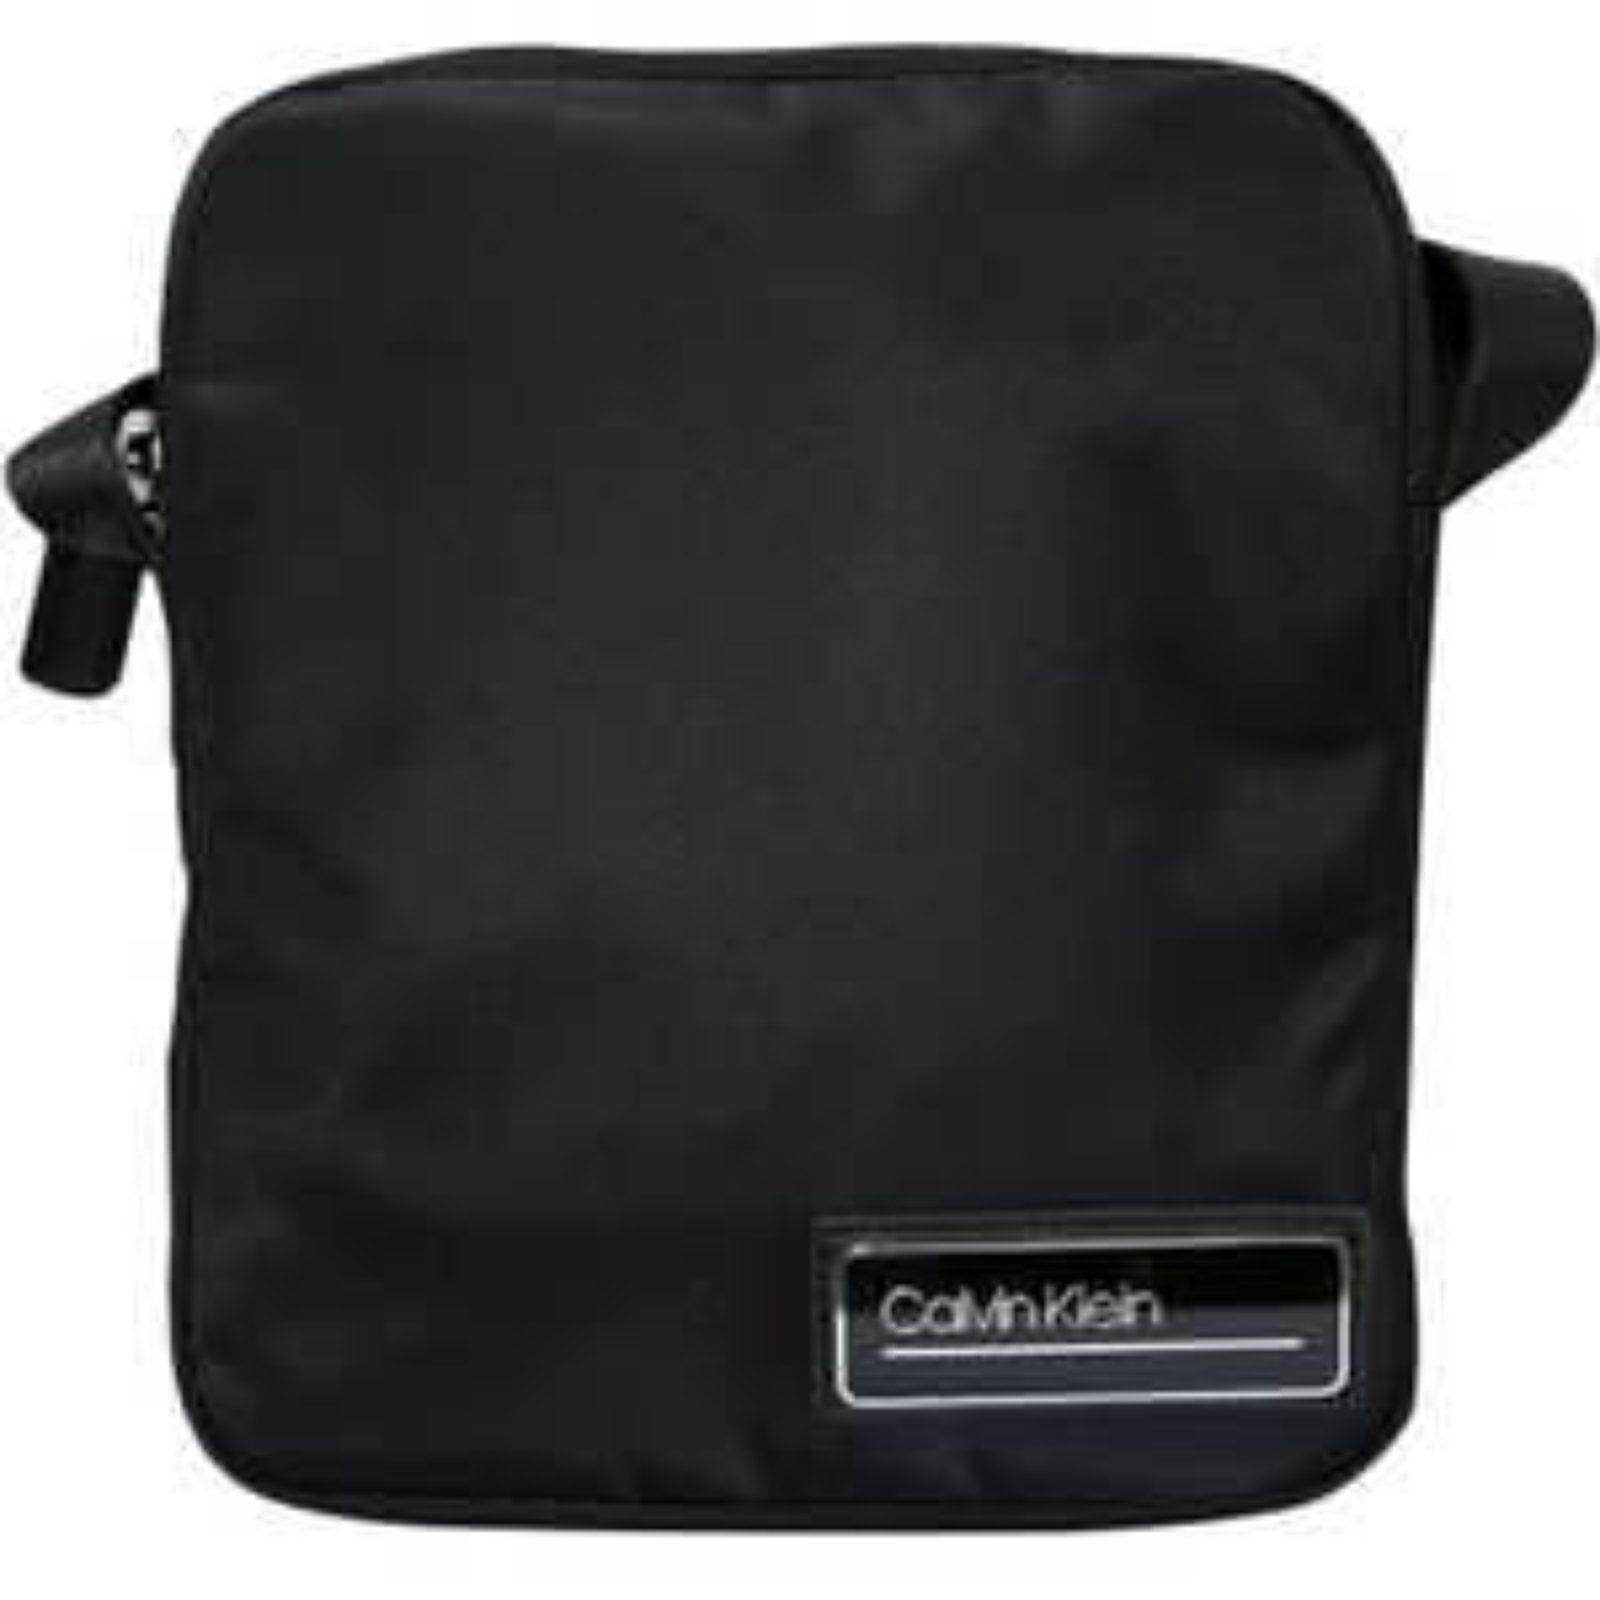 Calvin Klein Men's Primary Mini Reporter Shoulder Bag 20x23x6cm (Good £12.53/Very Good £13.24/Like New £13.95) + £4.49 NP @ Amazon Warehouse